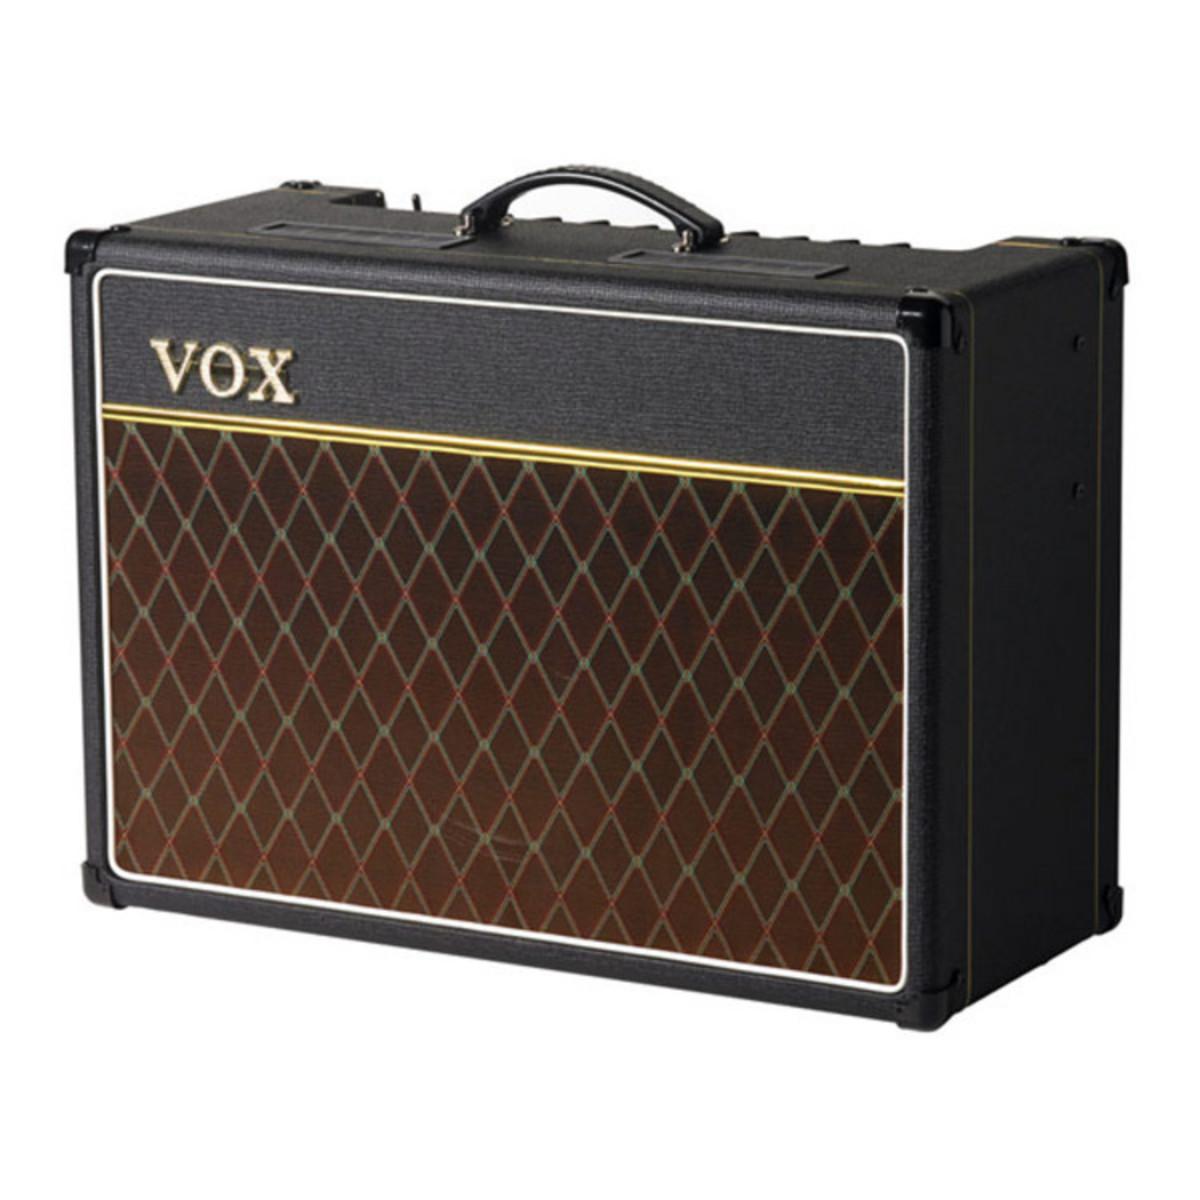 Vox Ac 15 : vox ac15 custom ac15c1x guitar amp with celestion alnico blue speaker box opened at gear4music ~ Russianpoet.info Haus und Dekorationen